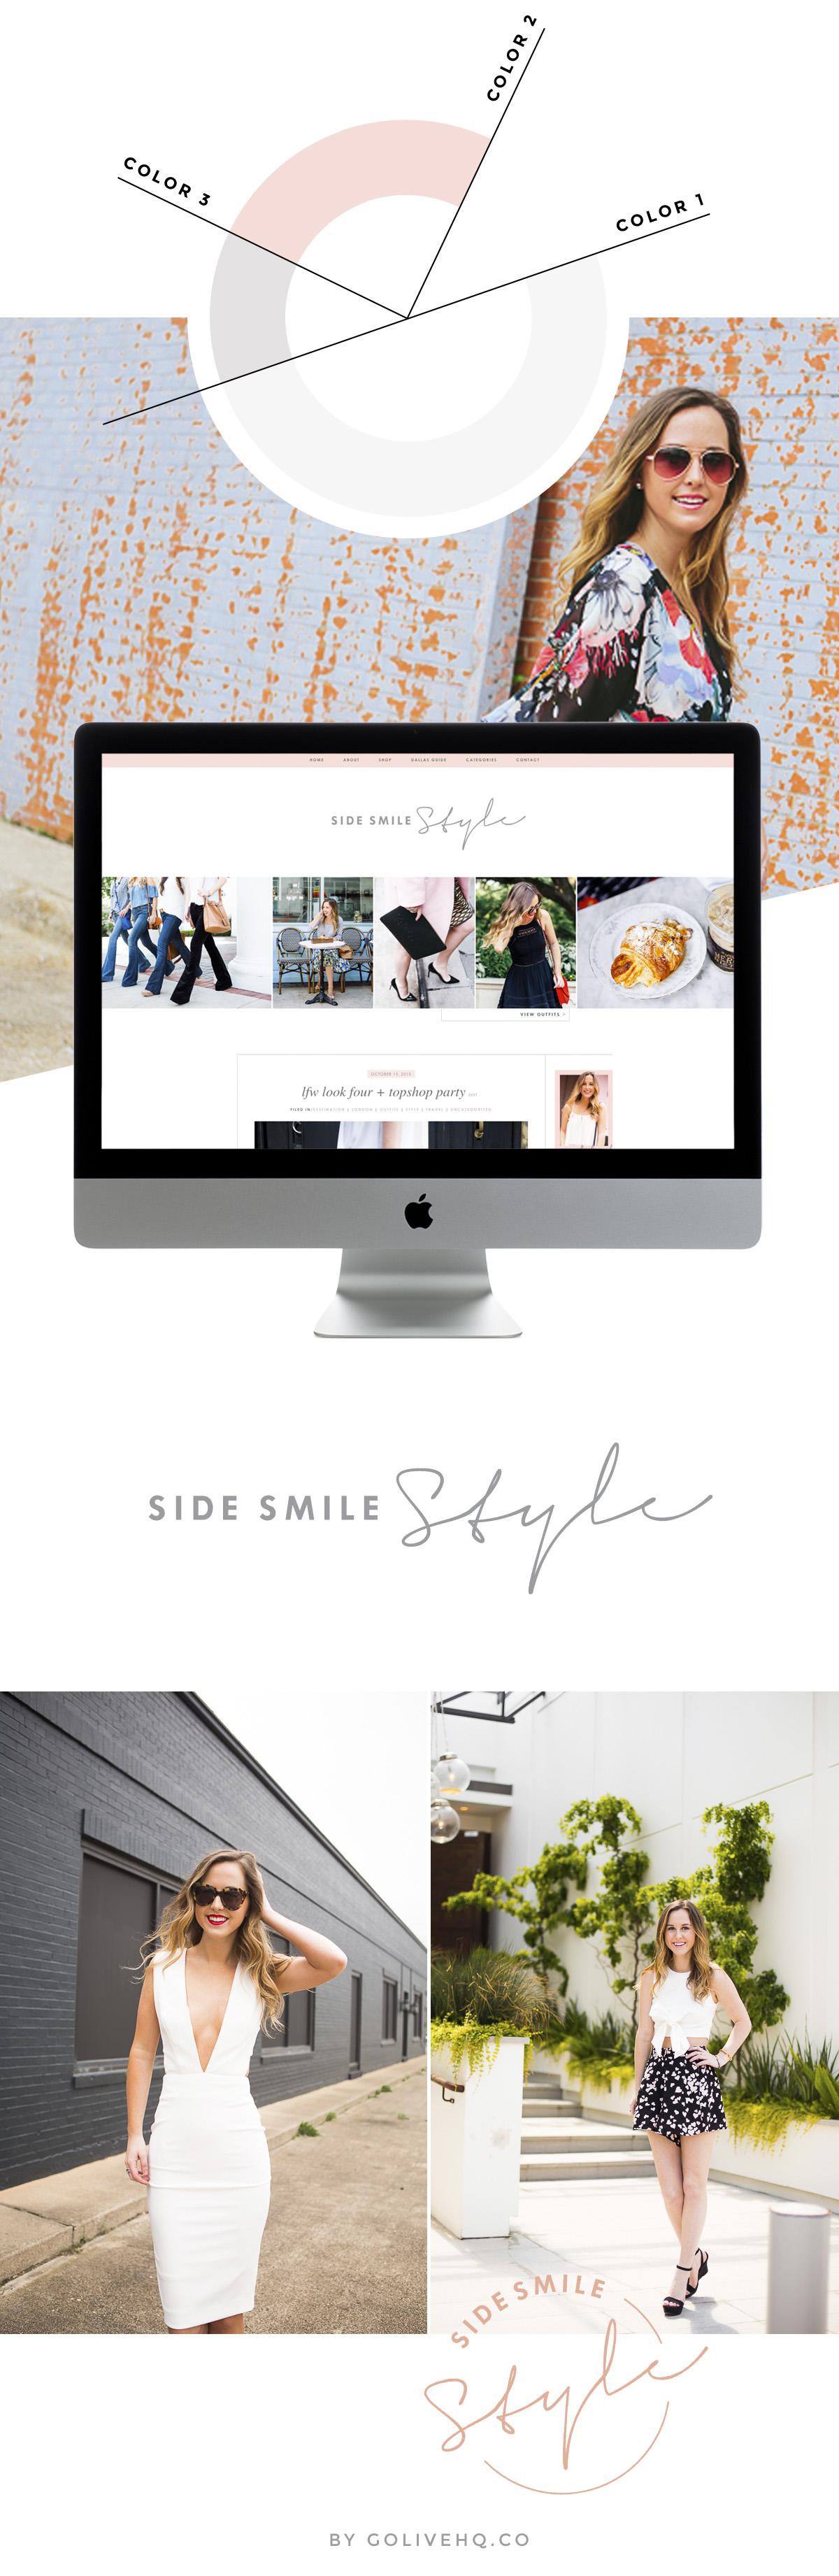 wordpress fashion blog website design     GOLIVEHQ.CO